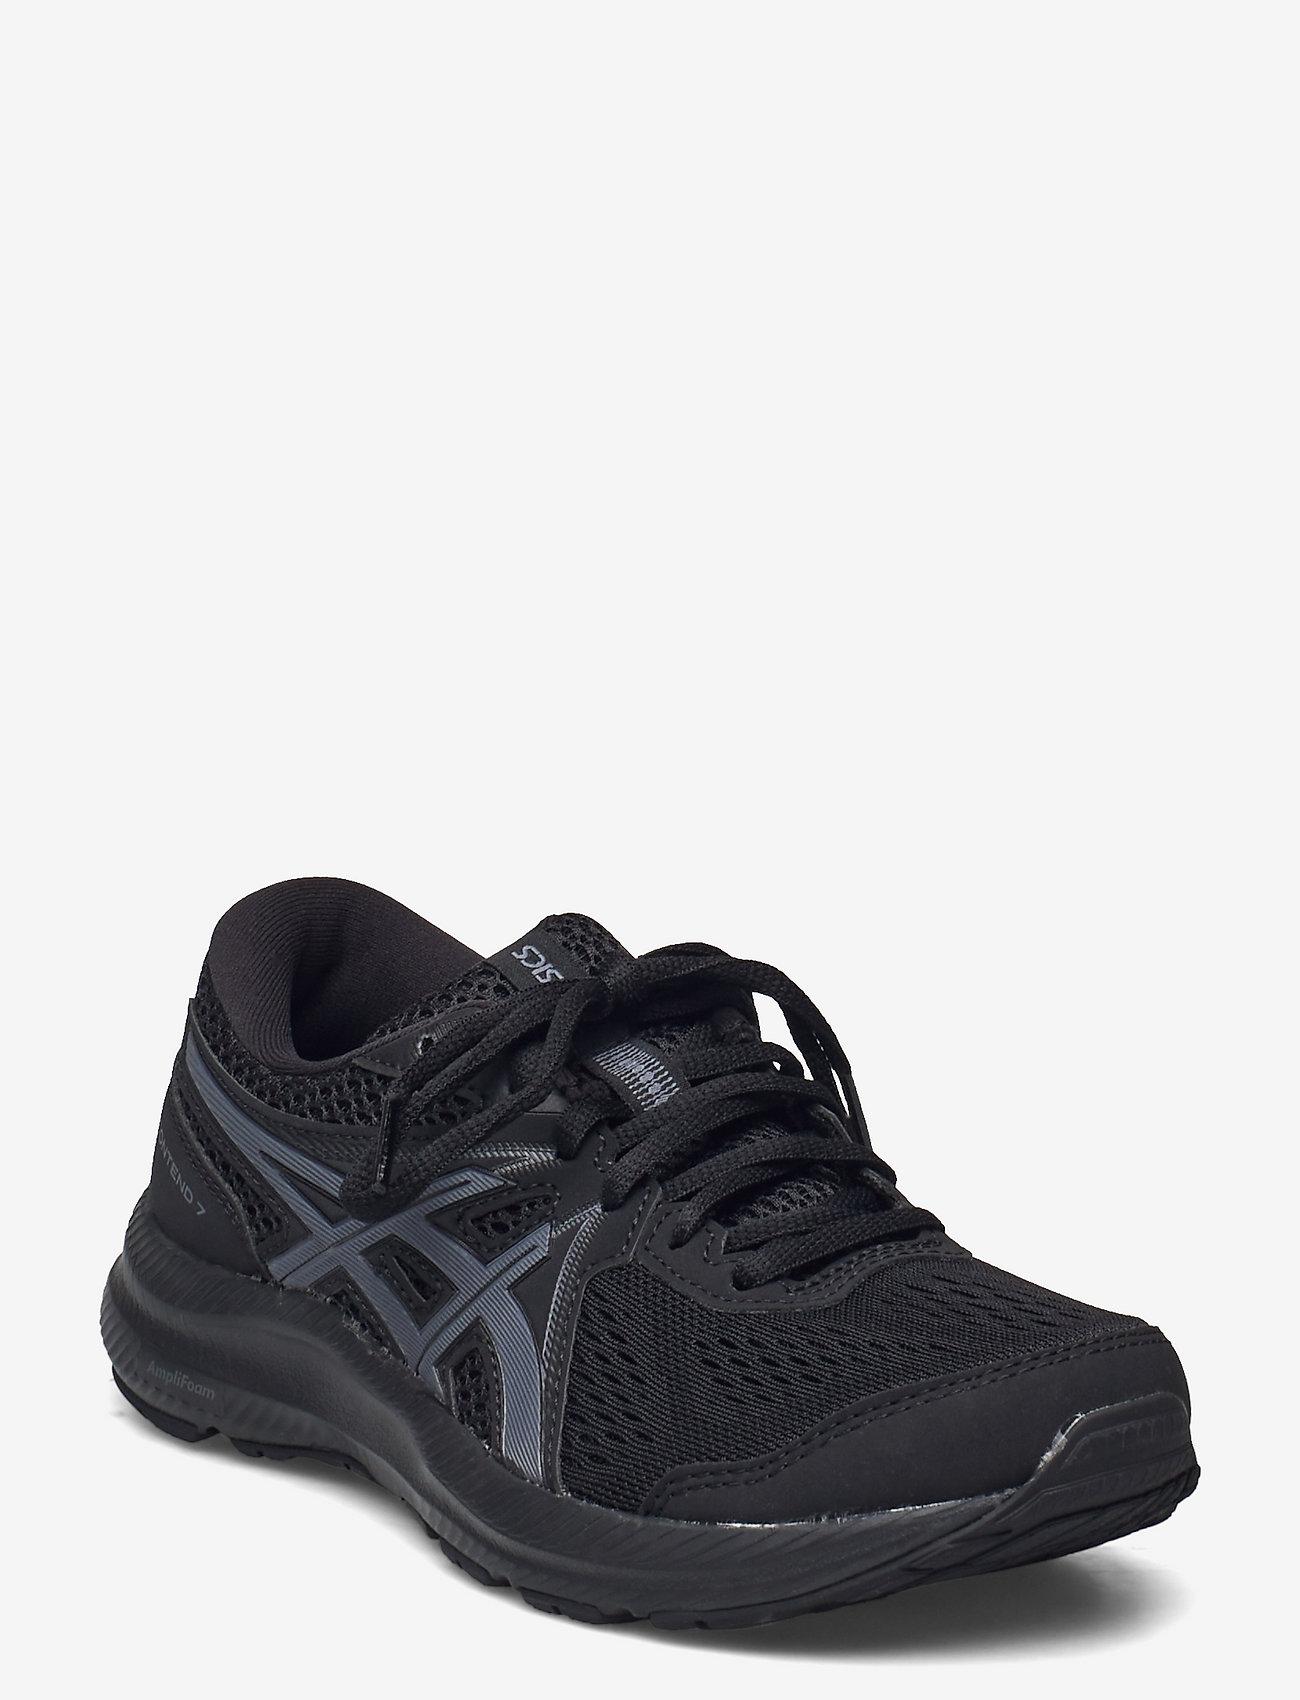 Asics - GEL-CONTEND 7 - running shoes - black/carrier grey - 0